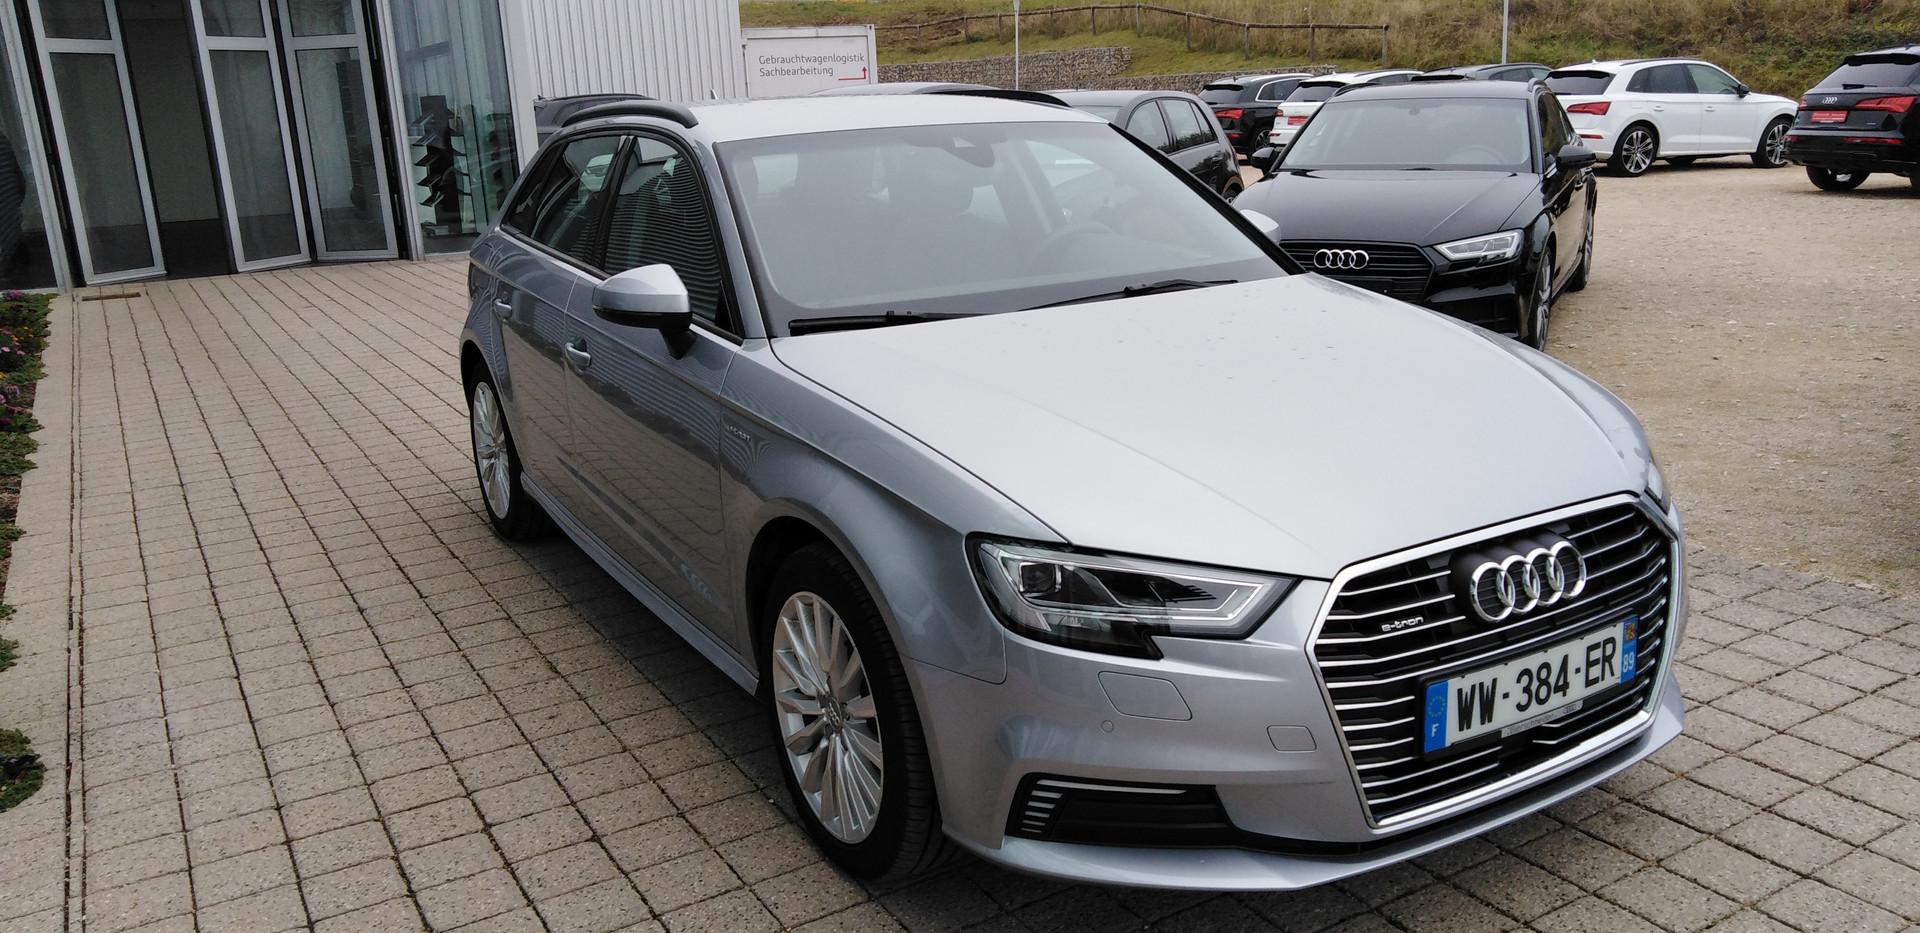 Audi A3 e_tron 1.4 e-tron 204 cv